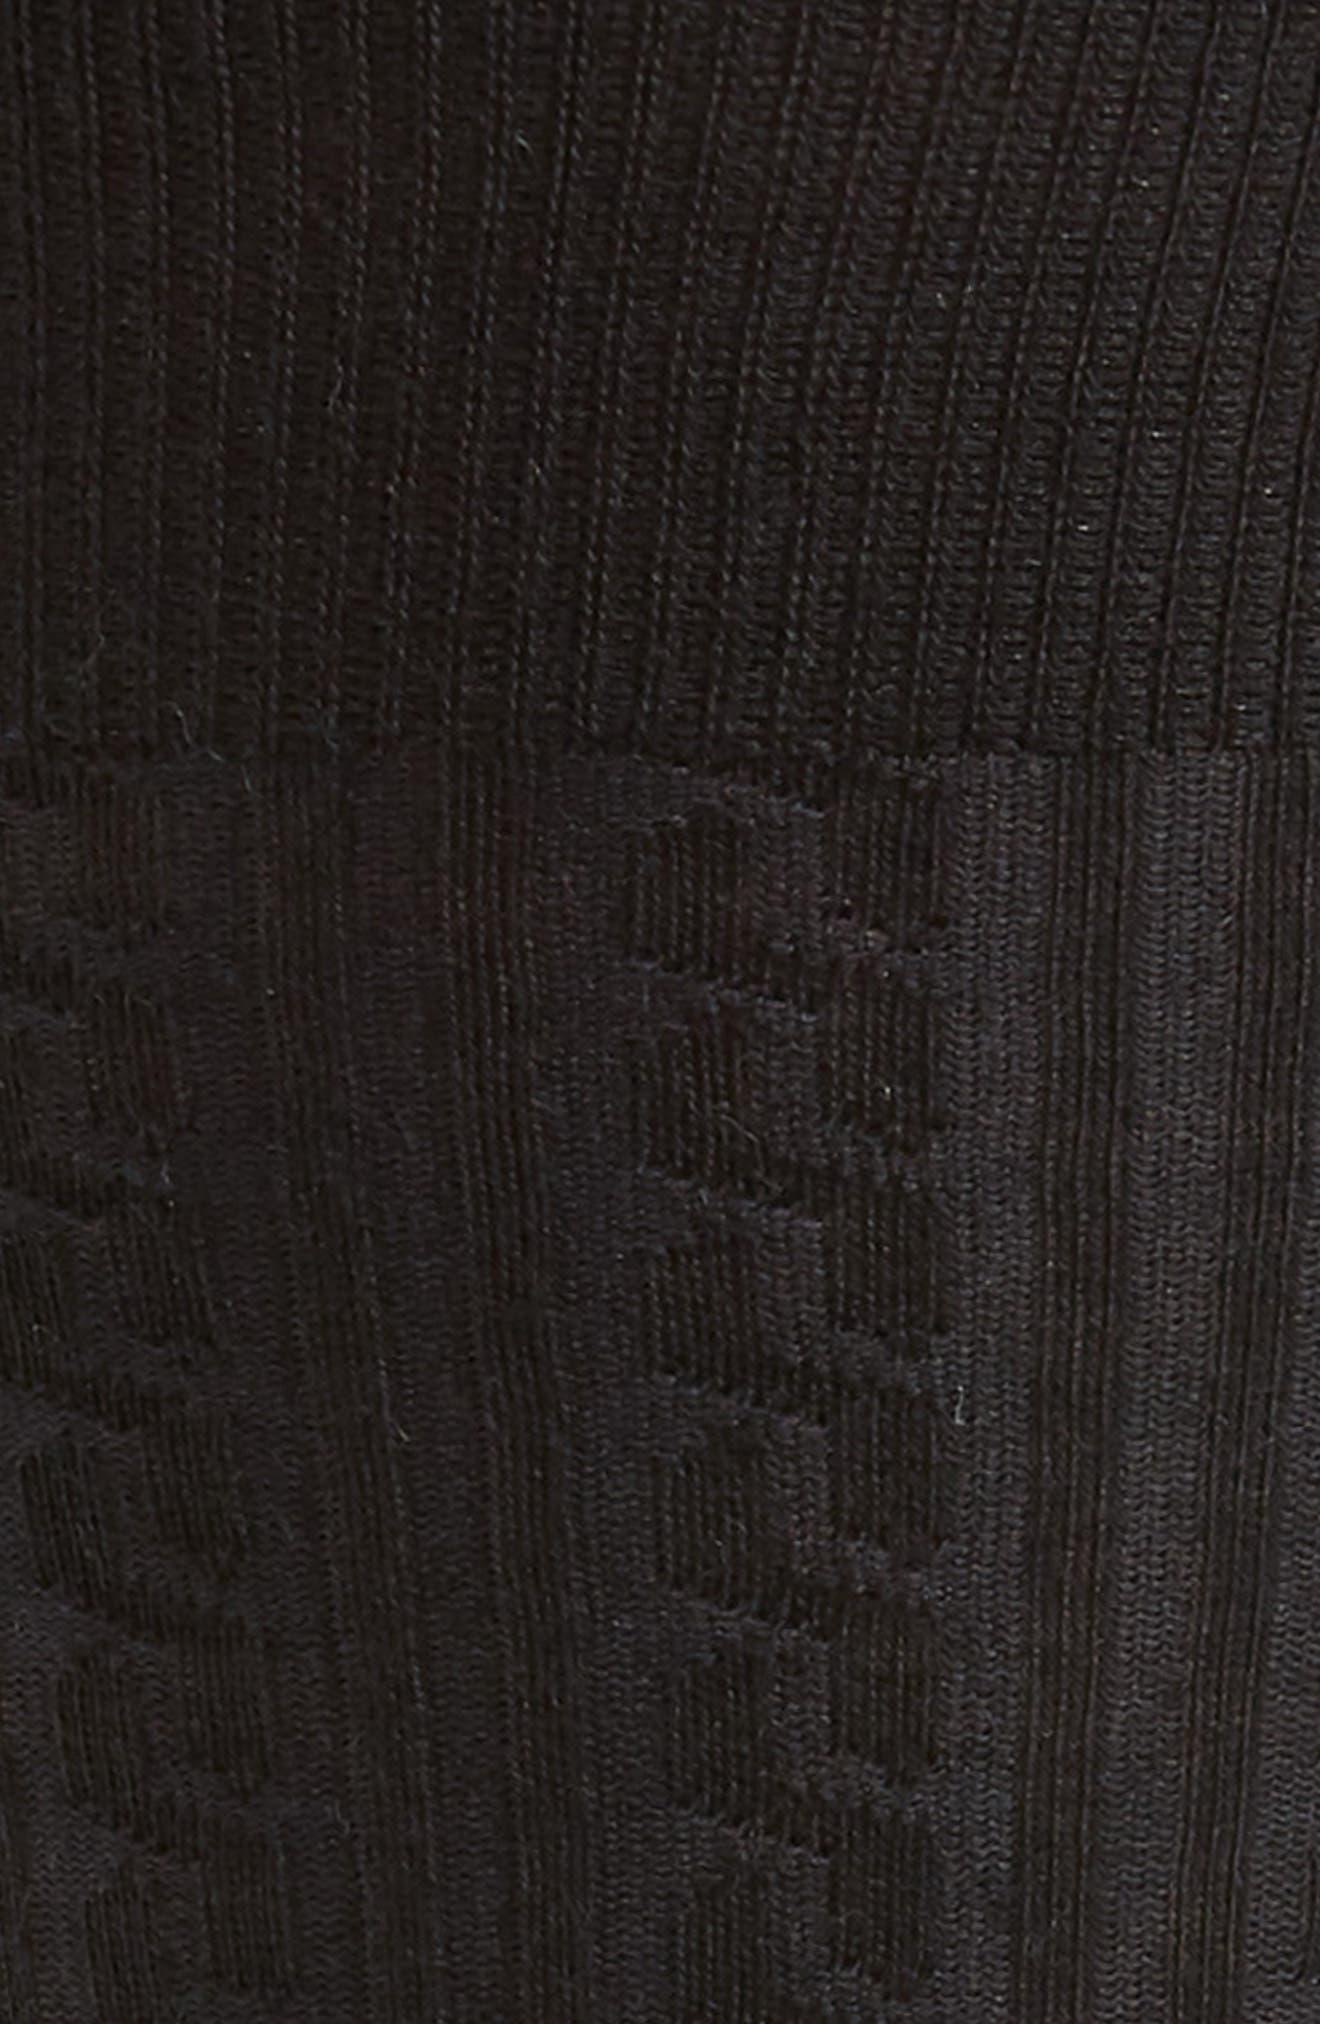 Cable Knit Merino Blend Socks,                             Alternate thumbnail 2, color,                             001